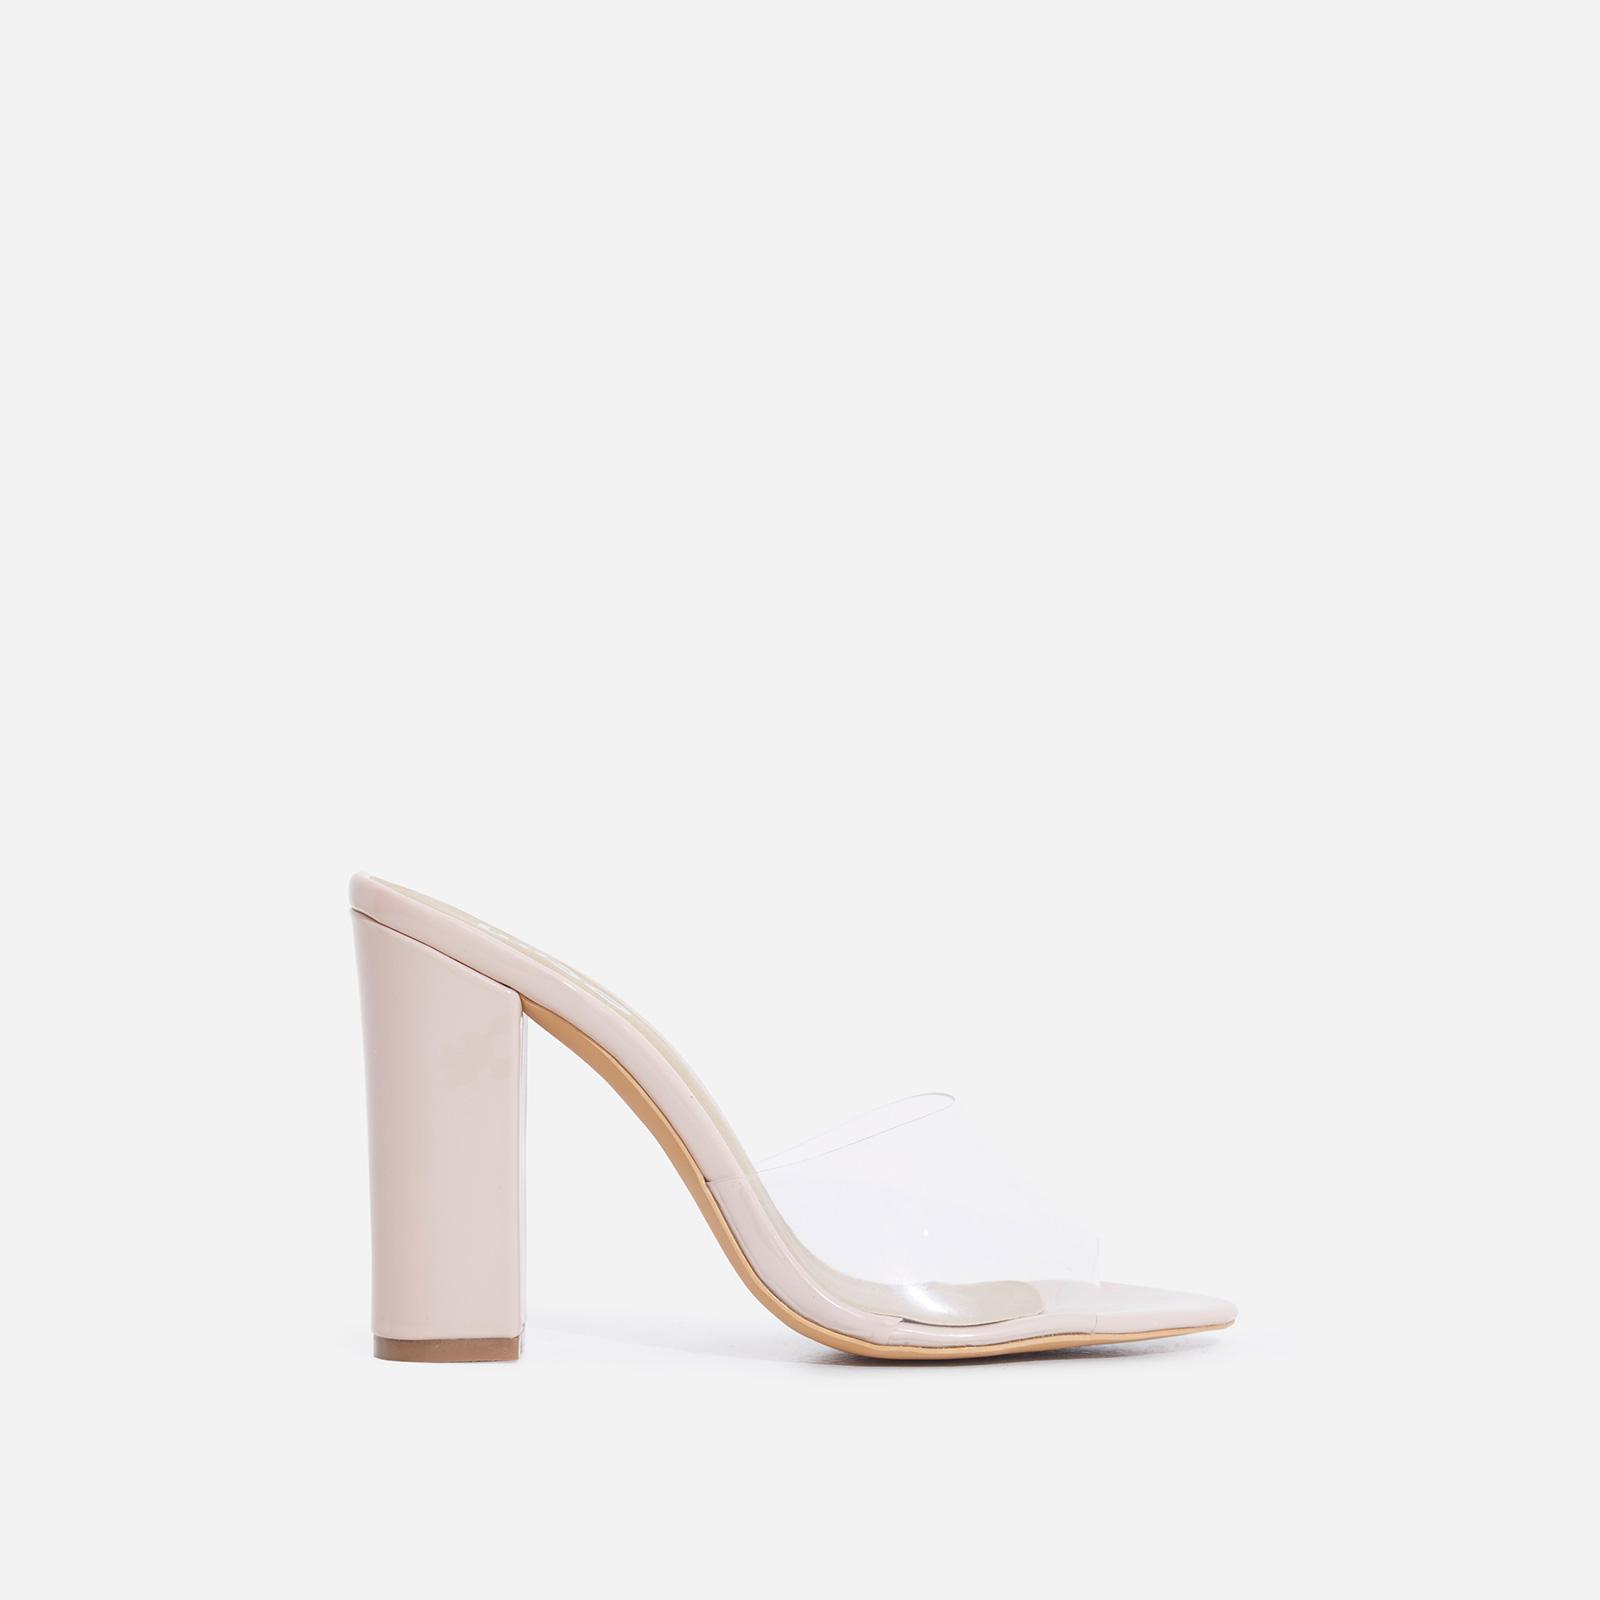 Kalia Peep Toe Perspex Block Heel In Nude Patent